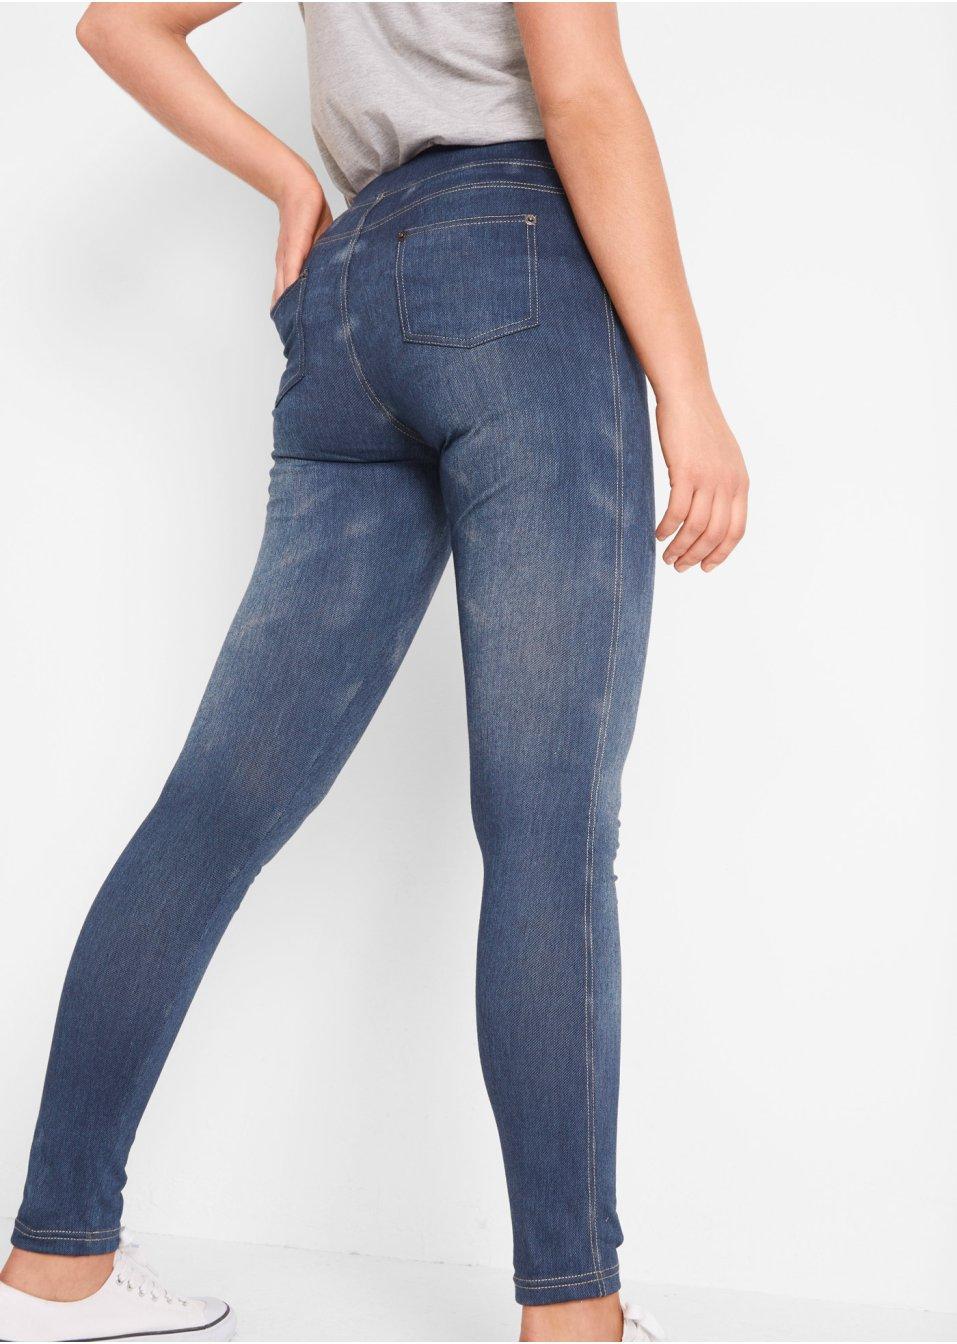 Mode Femme Vêtements DJLfdOFlkj Legging aspect jean bleu John Baner JEANSWEAR .fr